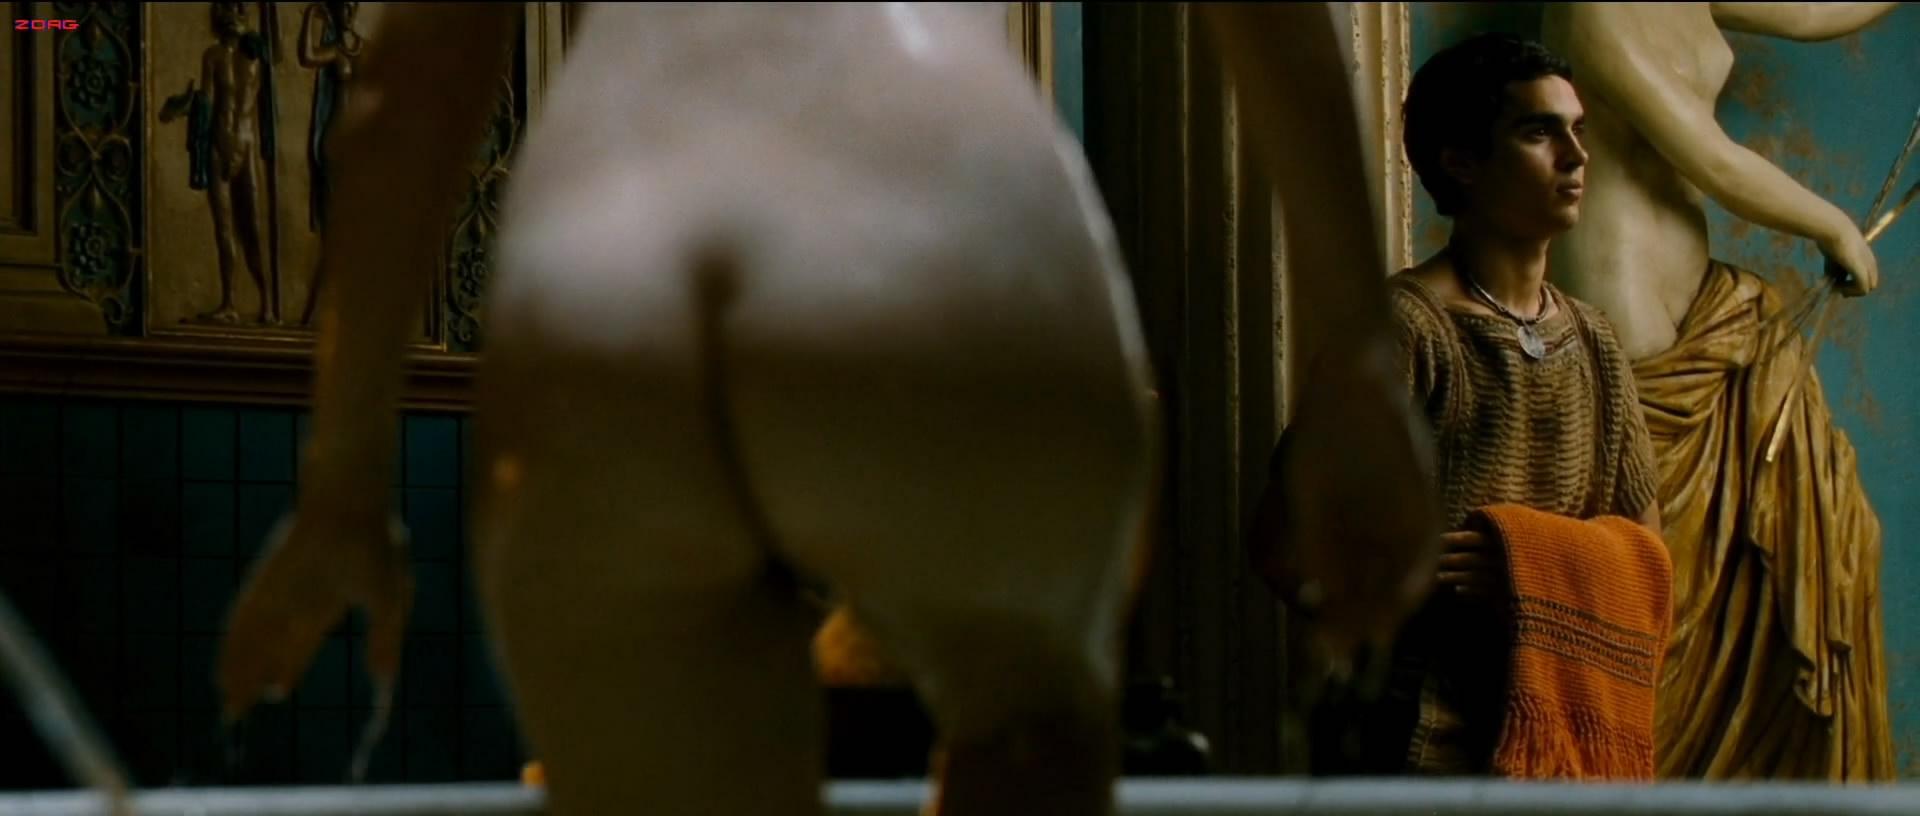 naked hot sexy black women playboy